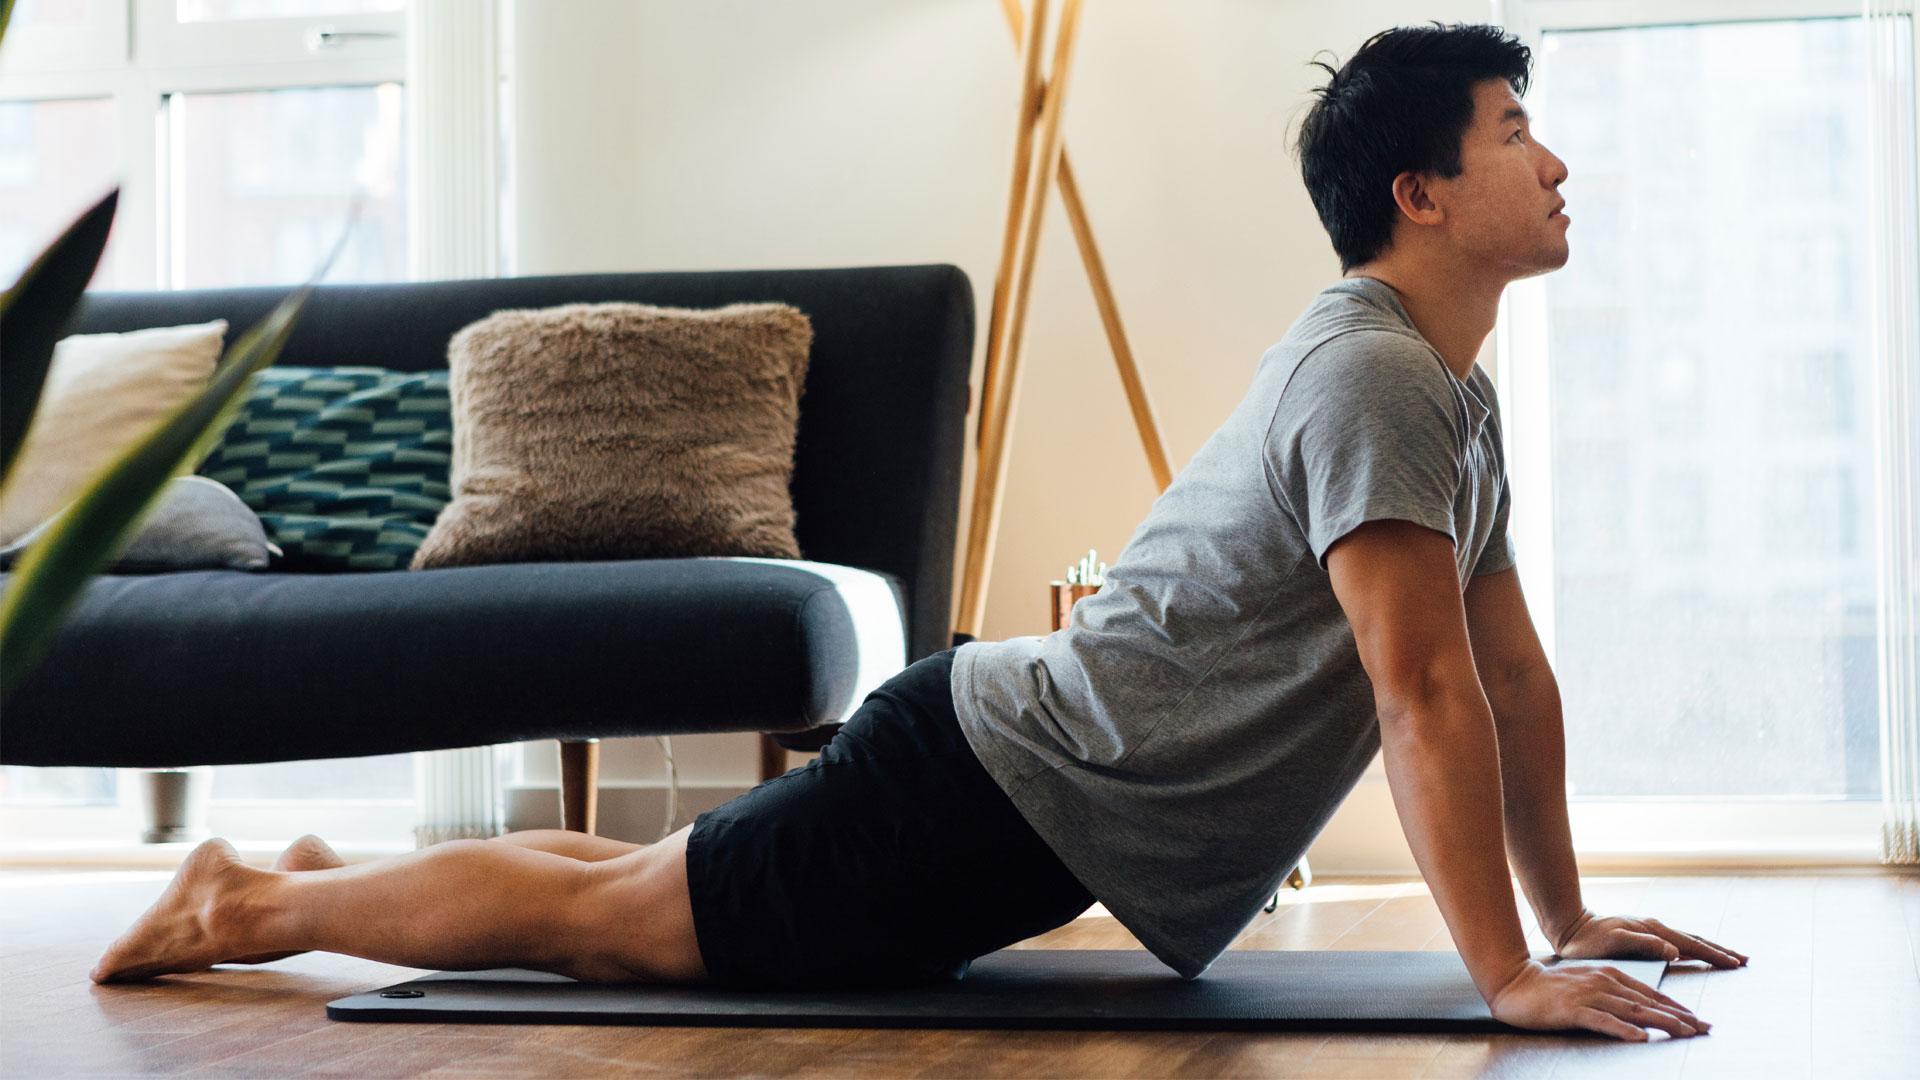 7 types of yoga: Image shows man doing yoga pose